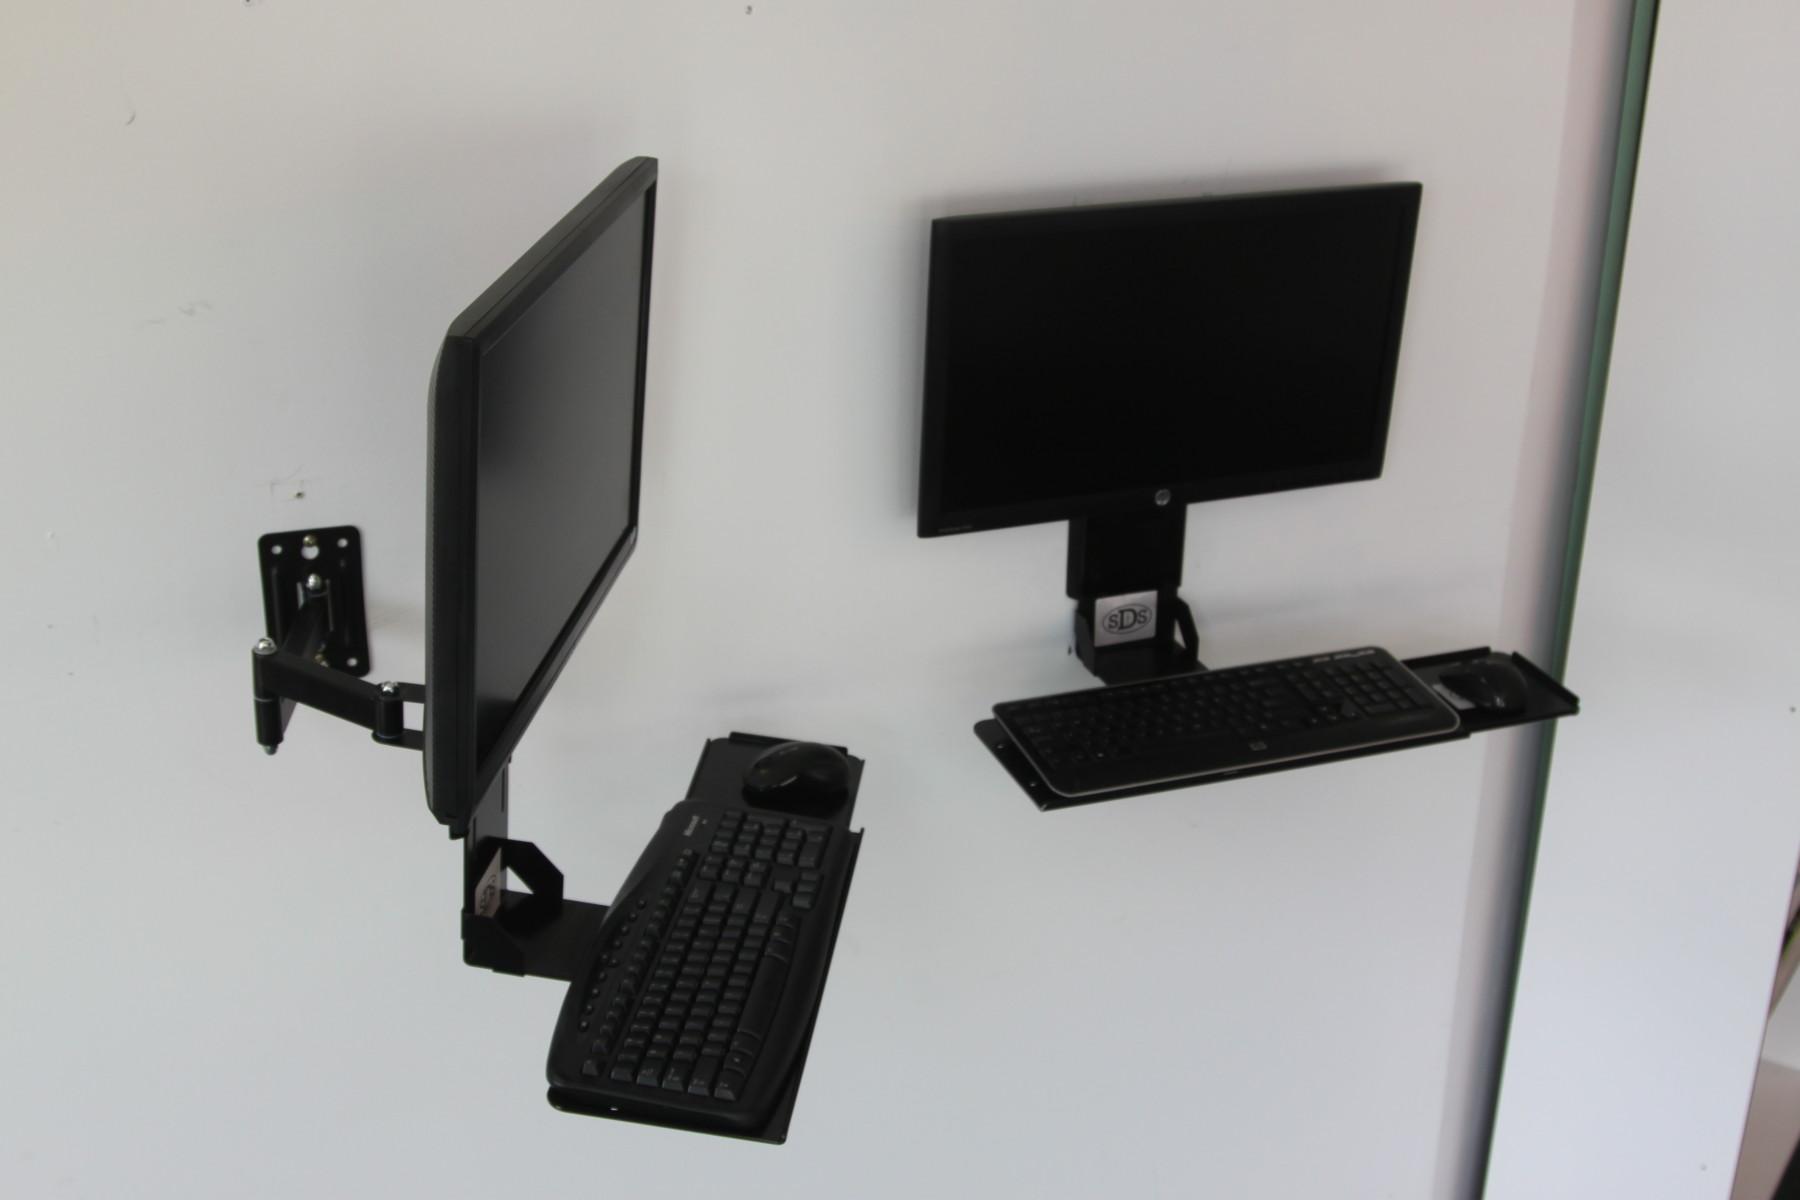 workrite keyboard tray installation instructions